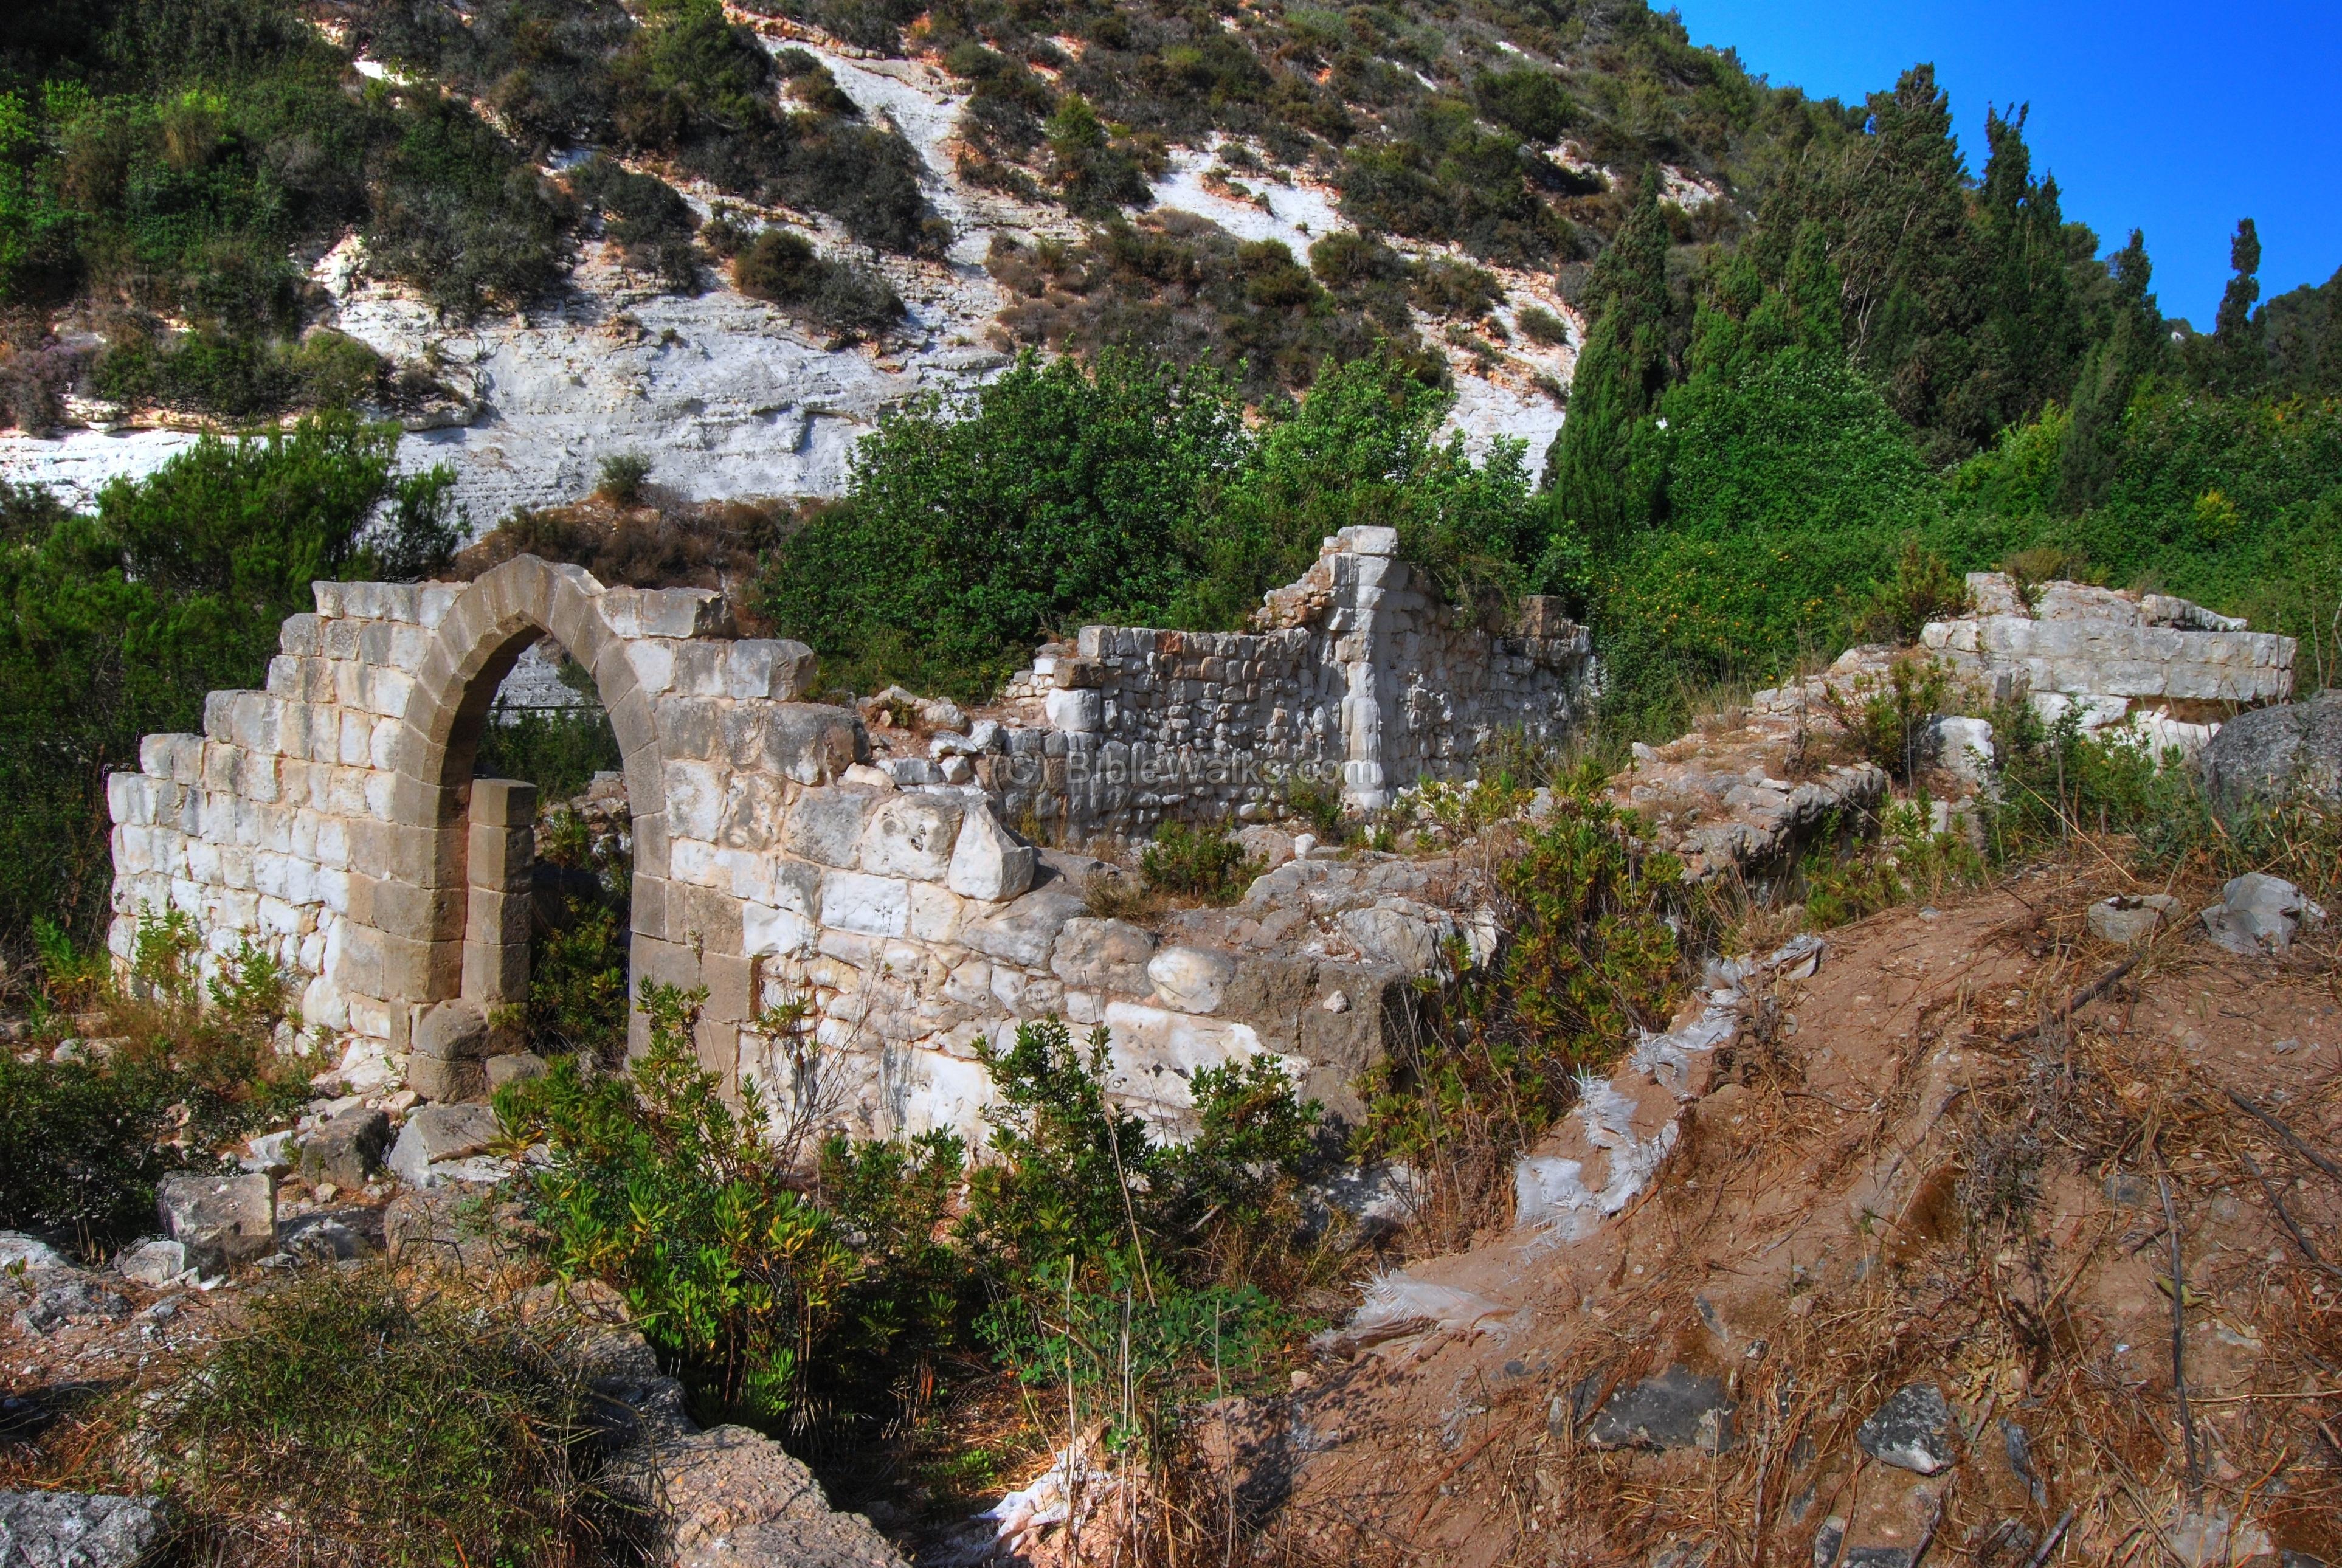 siah brook ruins of a carmelite monastery